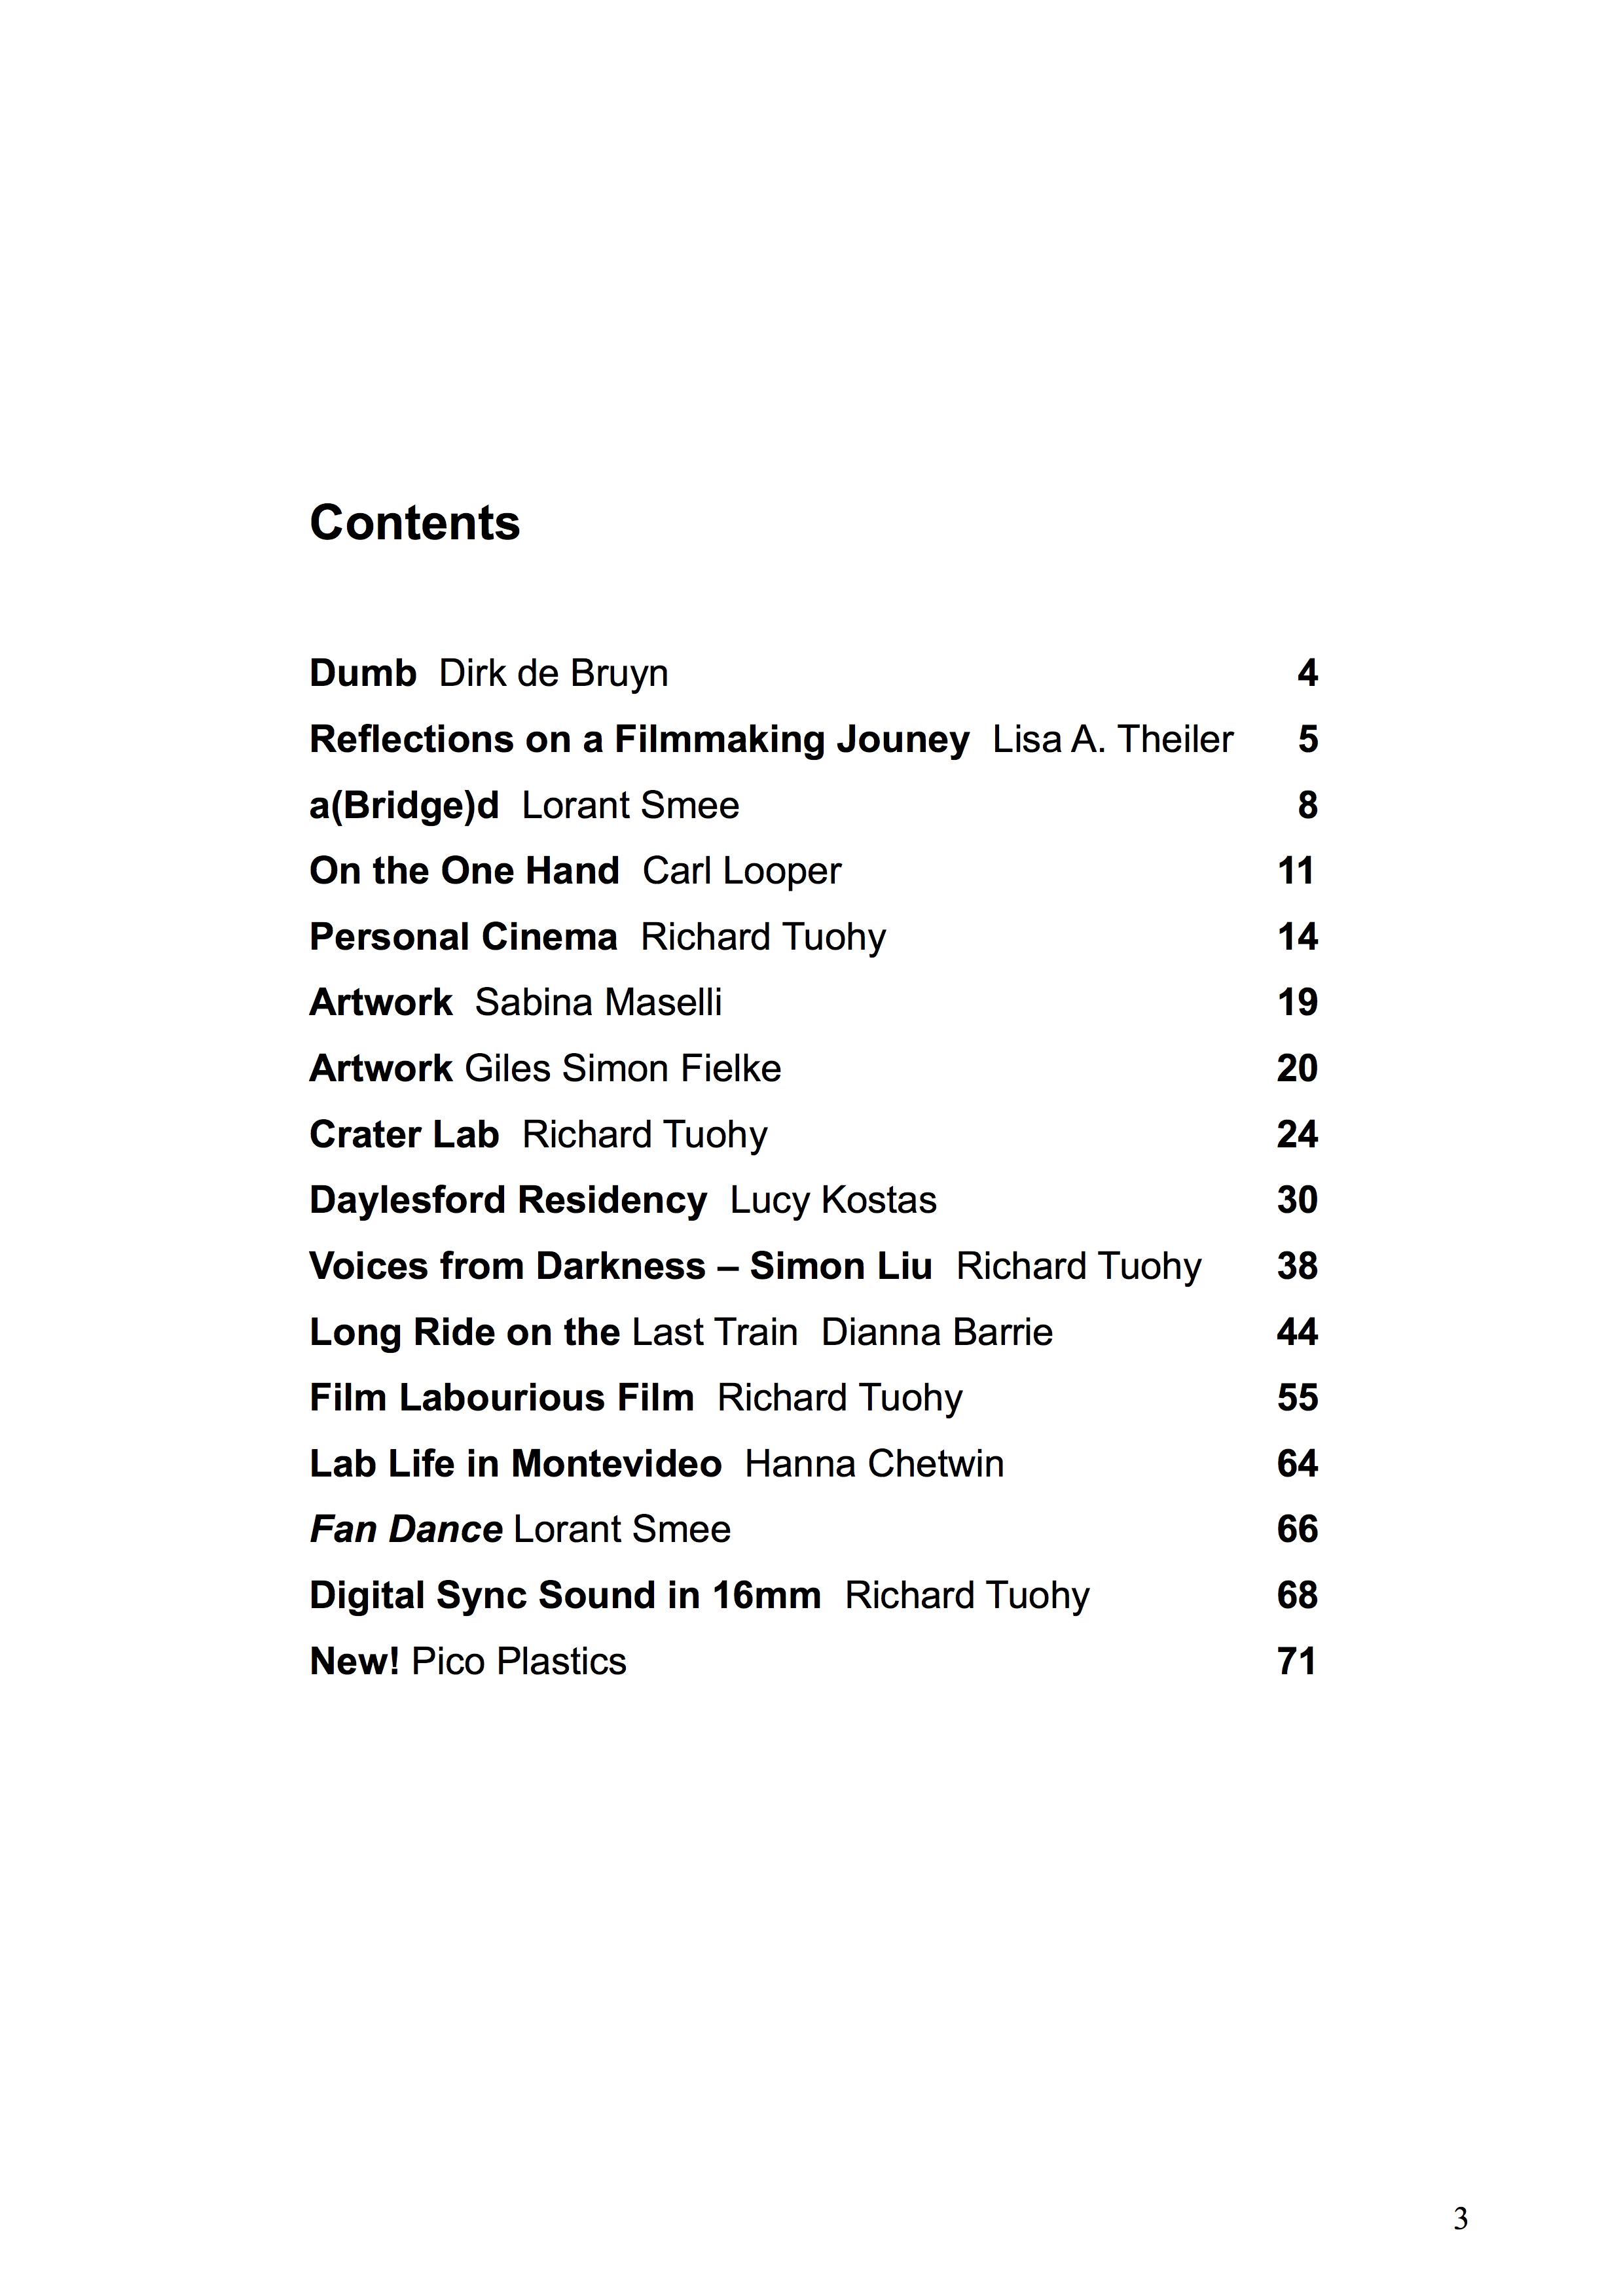 contents filmis1.jpg